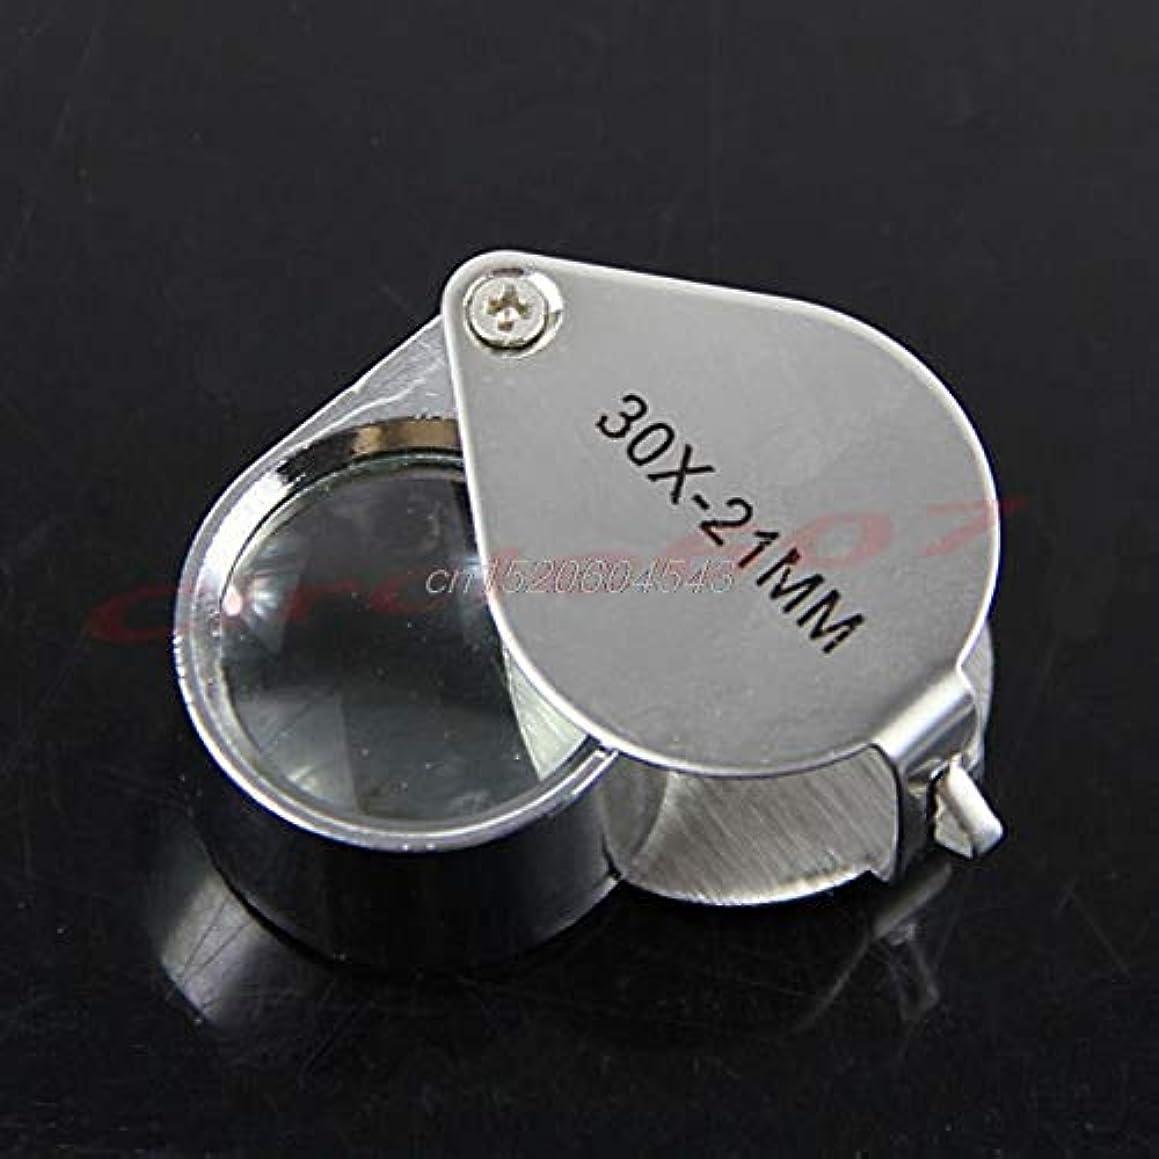 NJPOWER Triplet Jewelers Eye Loupe Magnifier Magnifying Glass Jewelry Diamond 30x21mm R06 Drop Ship